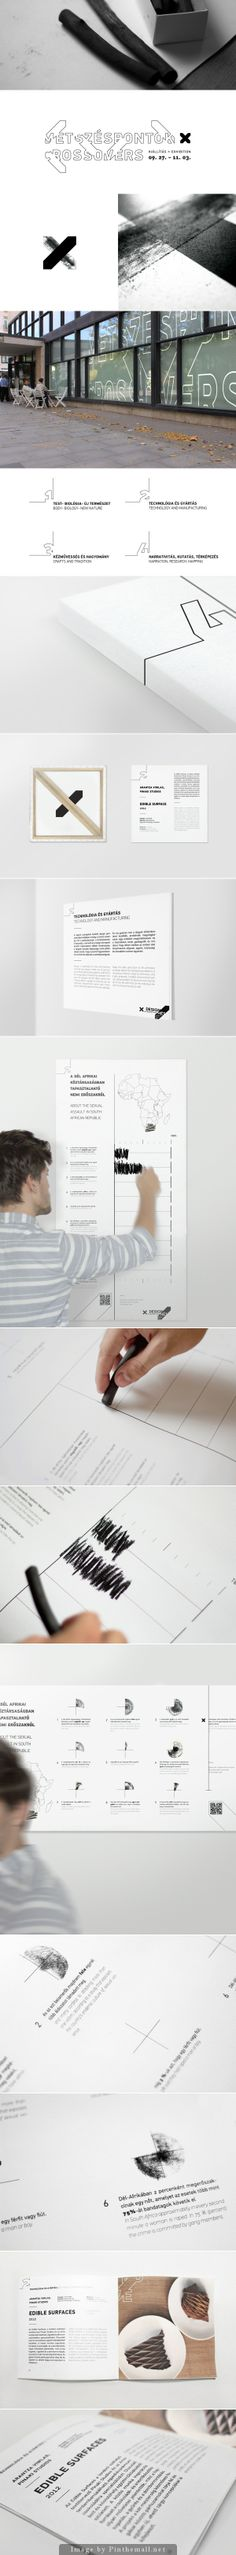 Exhibition design concept for X. Hungarian Design Week - Krisztián Lakosi, Nora Demeczky